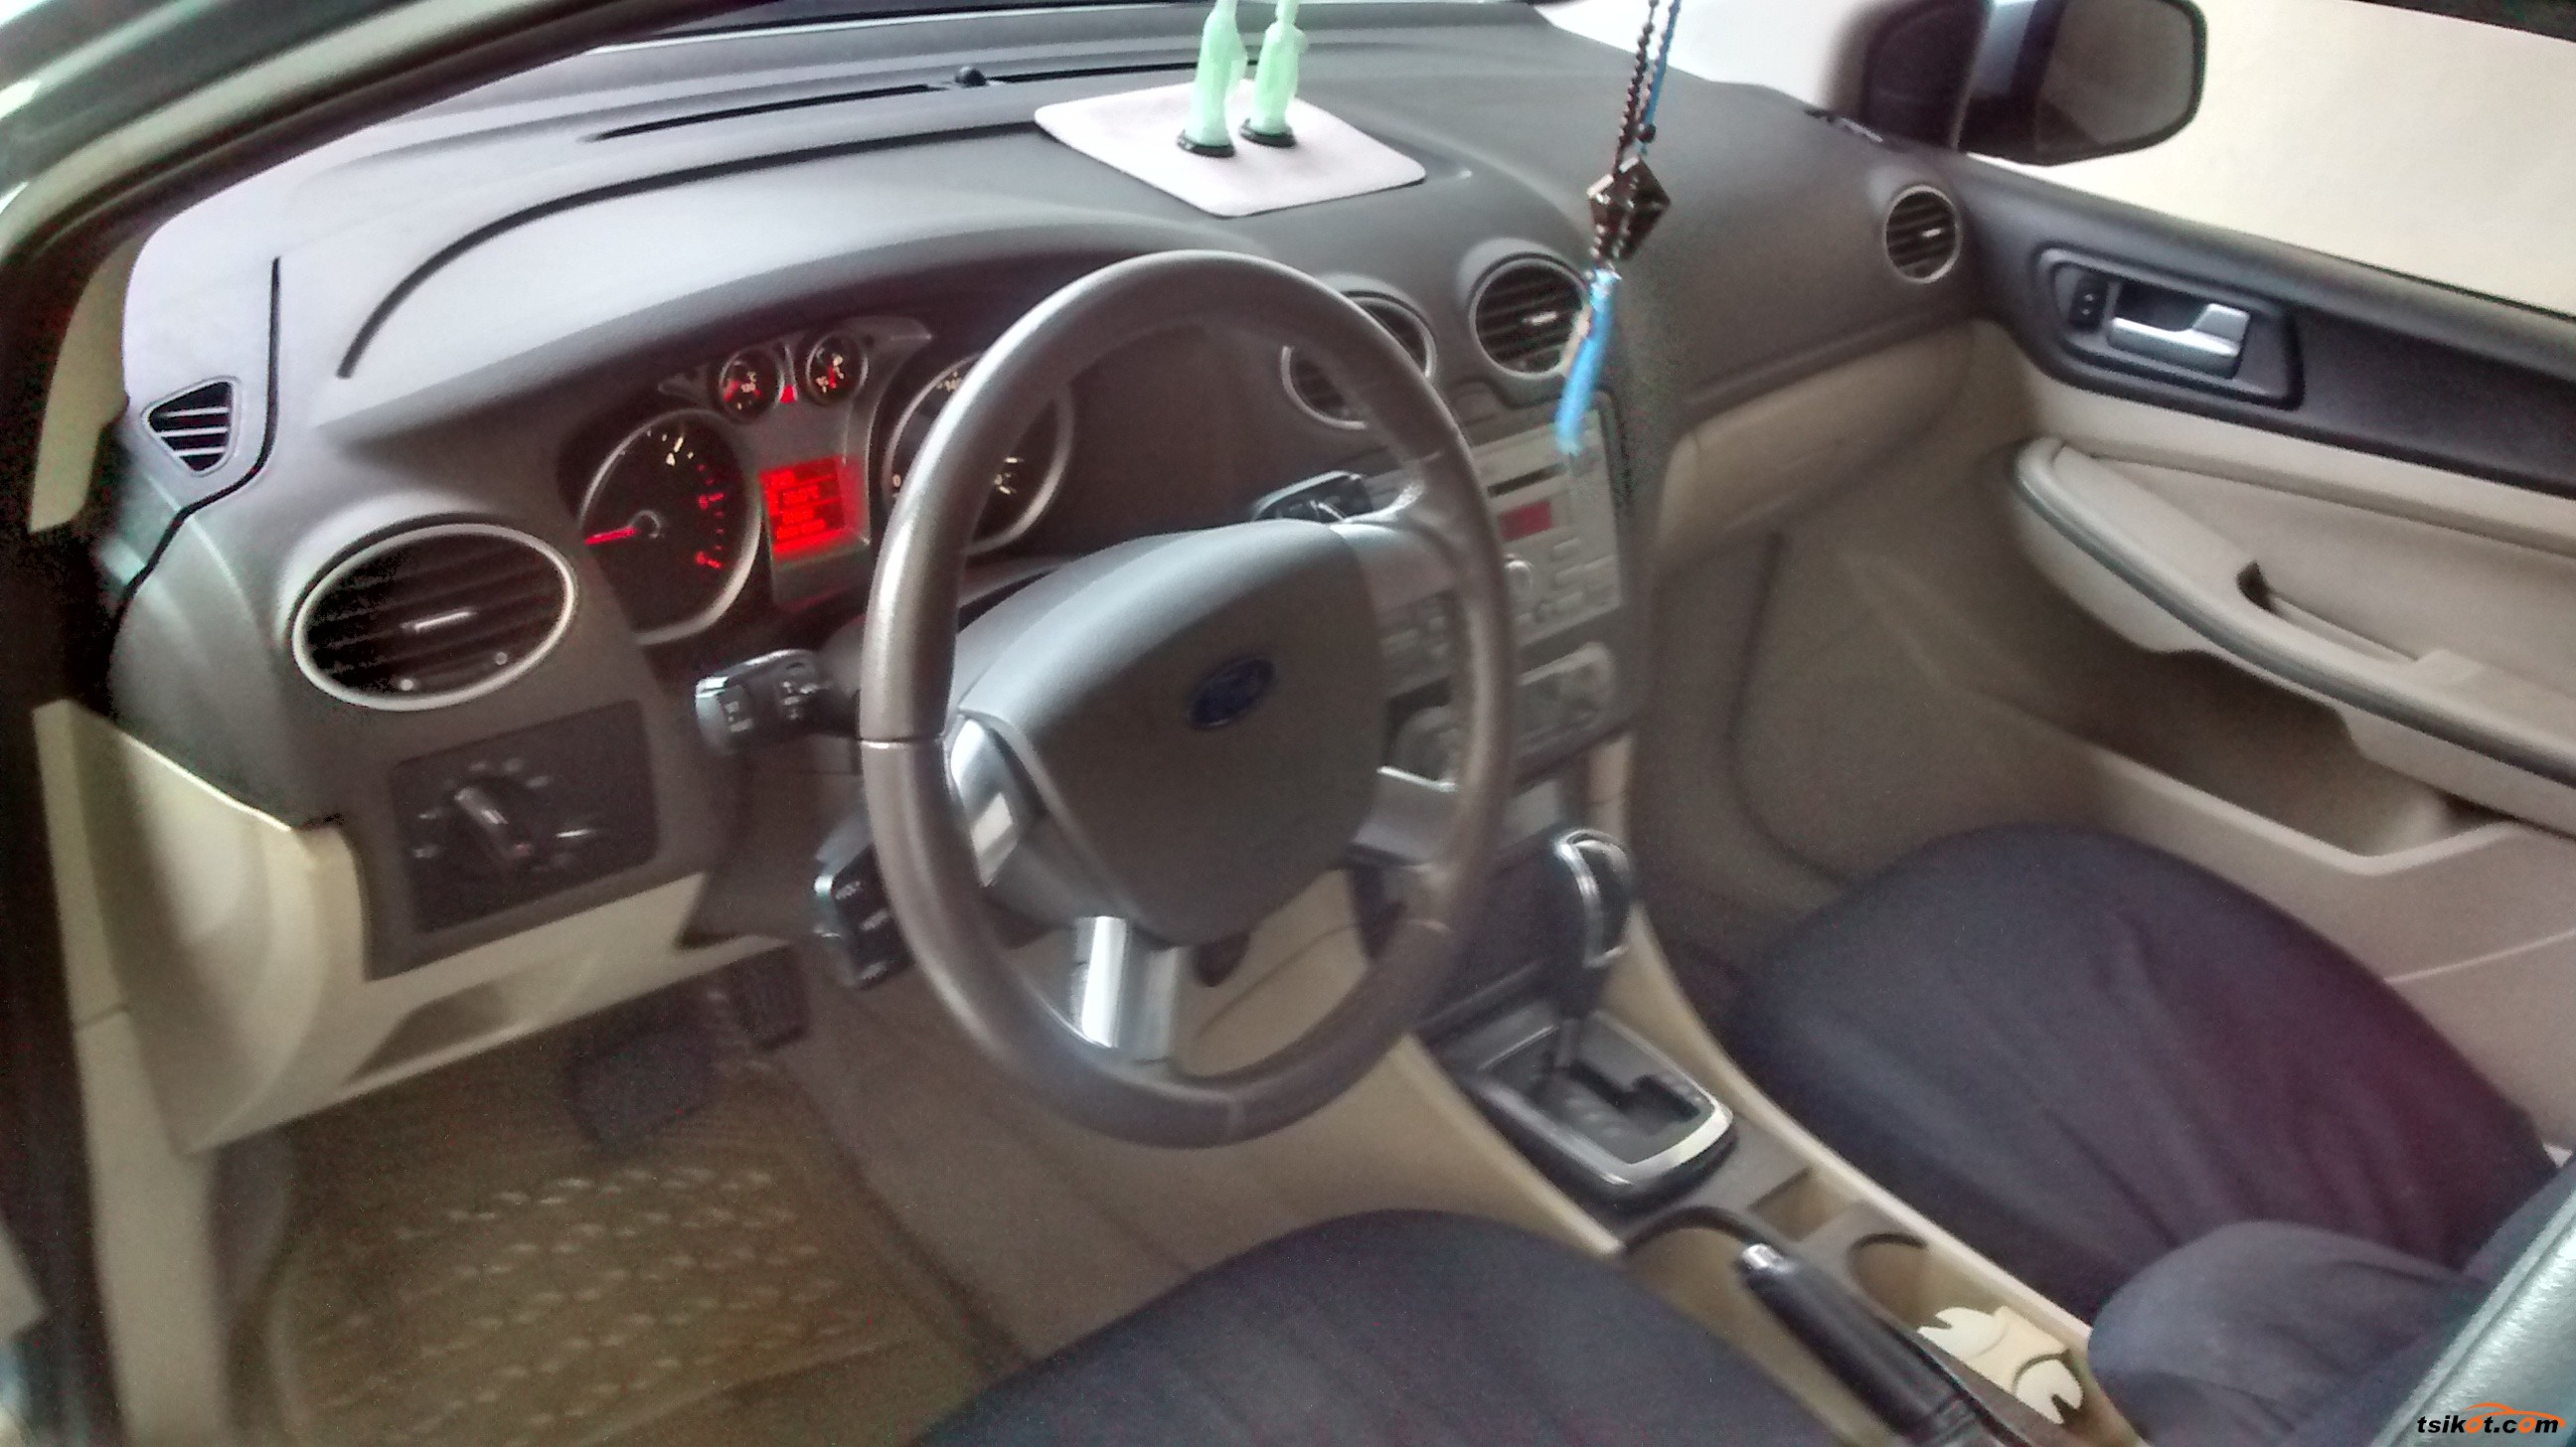 Ford Focus 2011 - 6